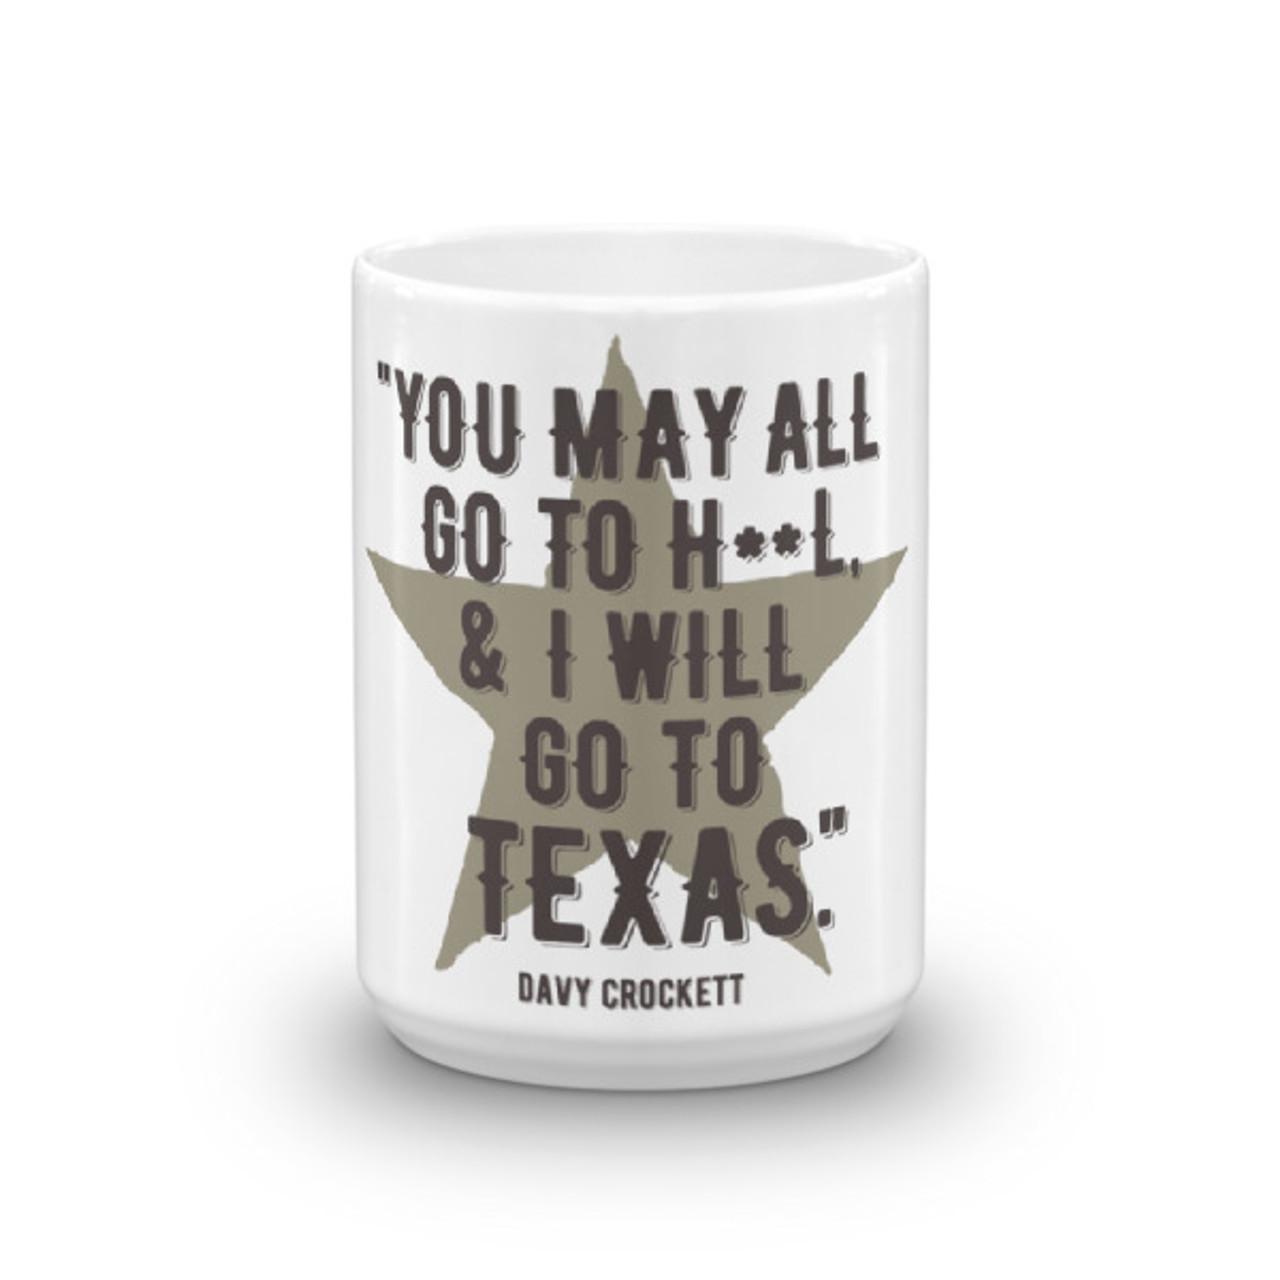 """I WIll Go to Texas"" - Davy Crockett Coffee Mug"